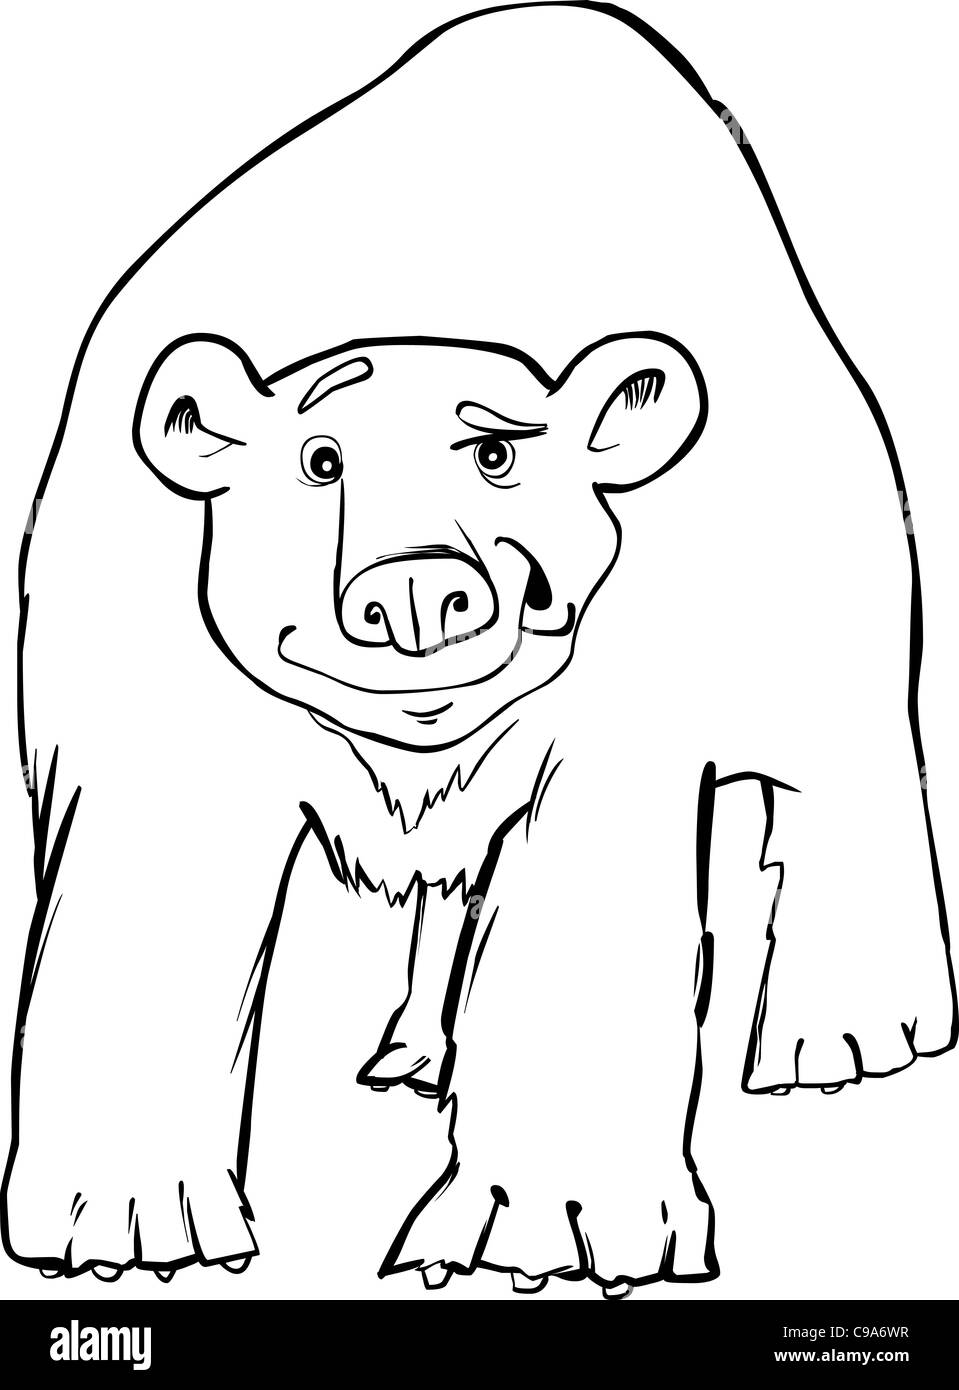 Cartoon Illustration Of Funny Polar Bear Coloring Page Stock Photo